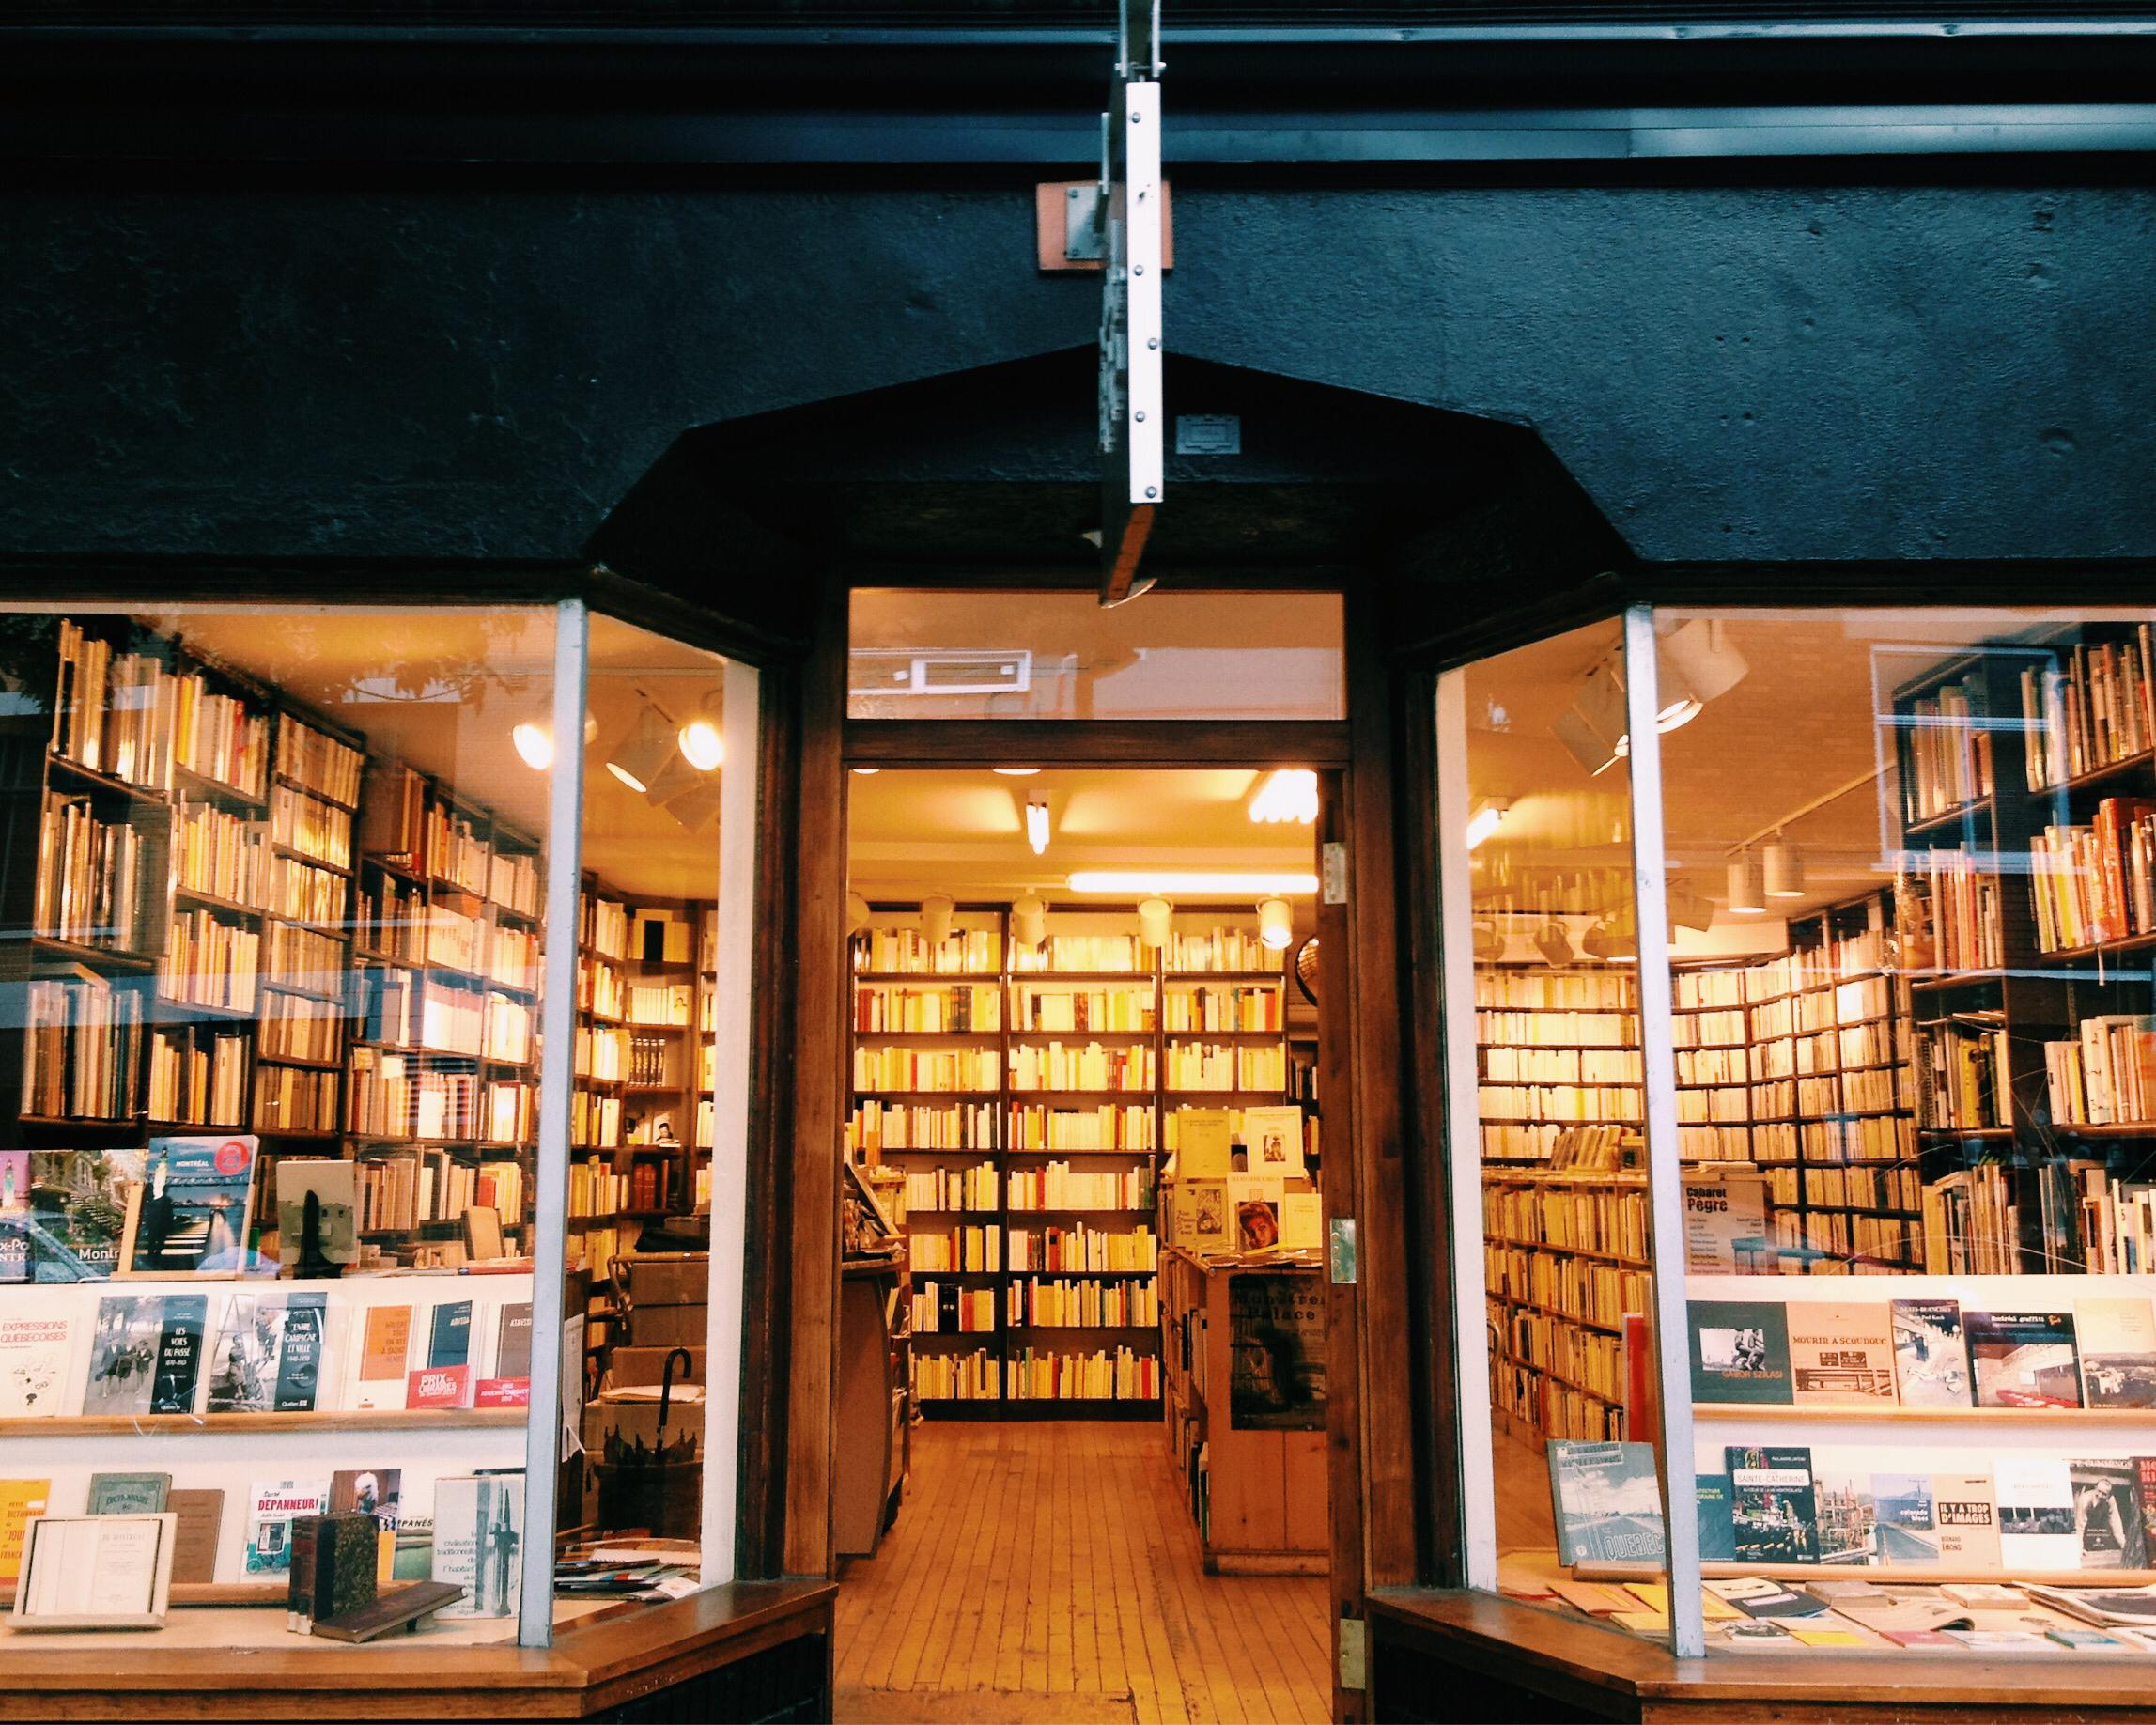 Librairie Le port de tête in the Plateau via Lora Weaver Mysteries by Katy Leen